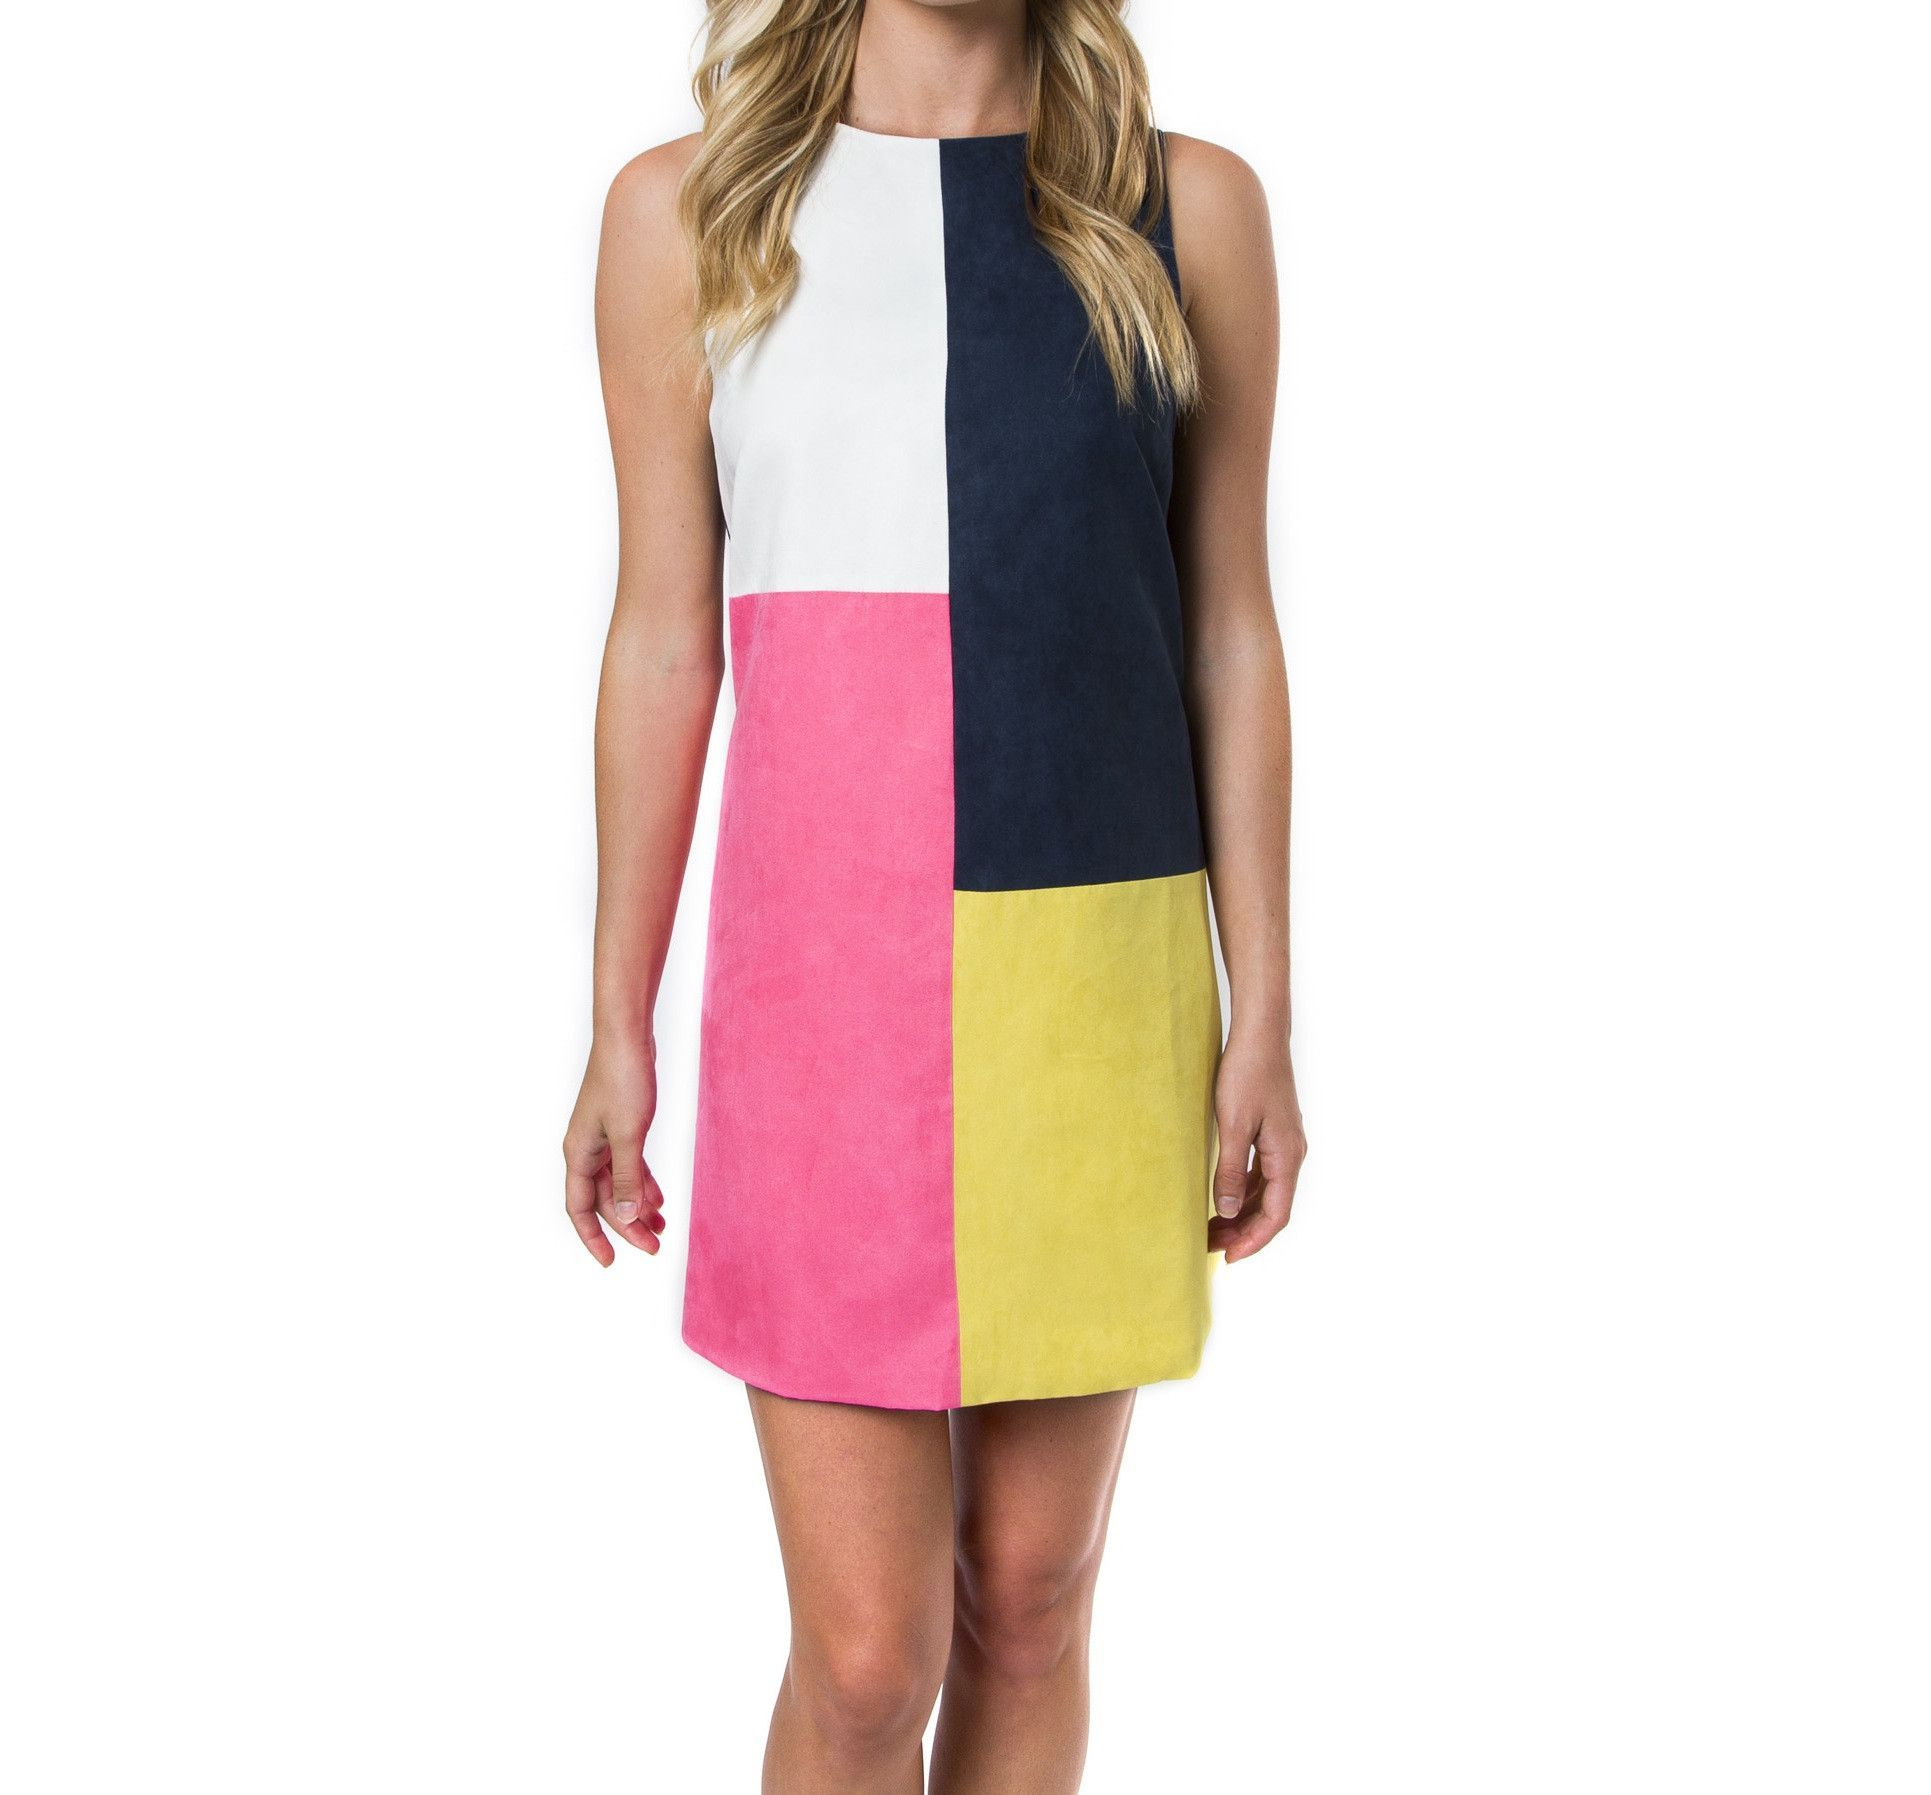 Twiggy twist color block dress block dress twiggy and color blocking